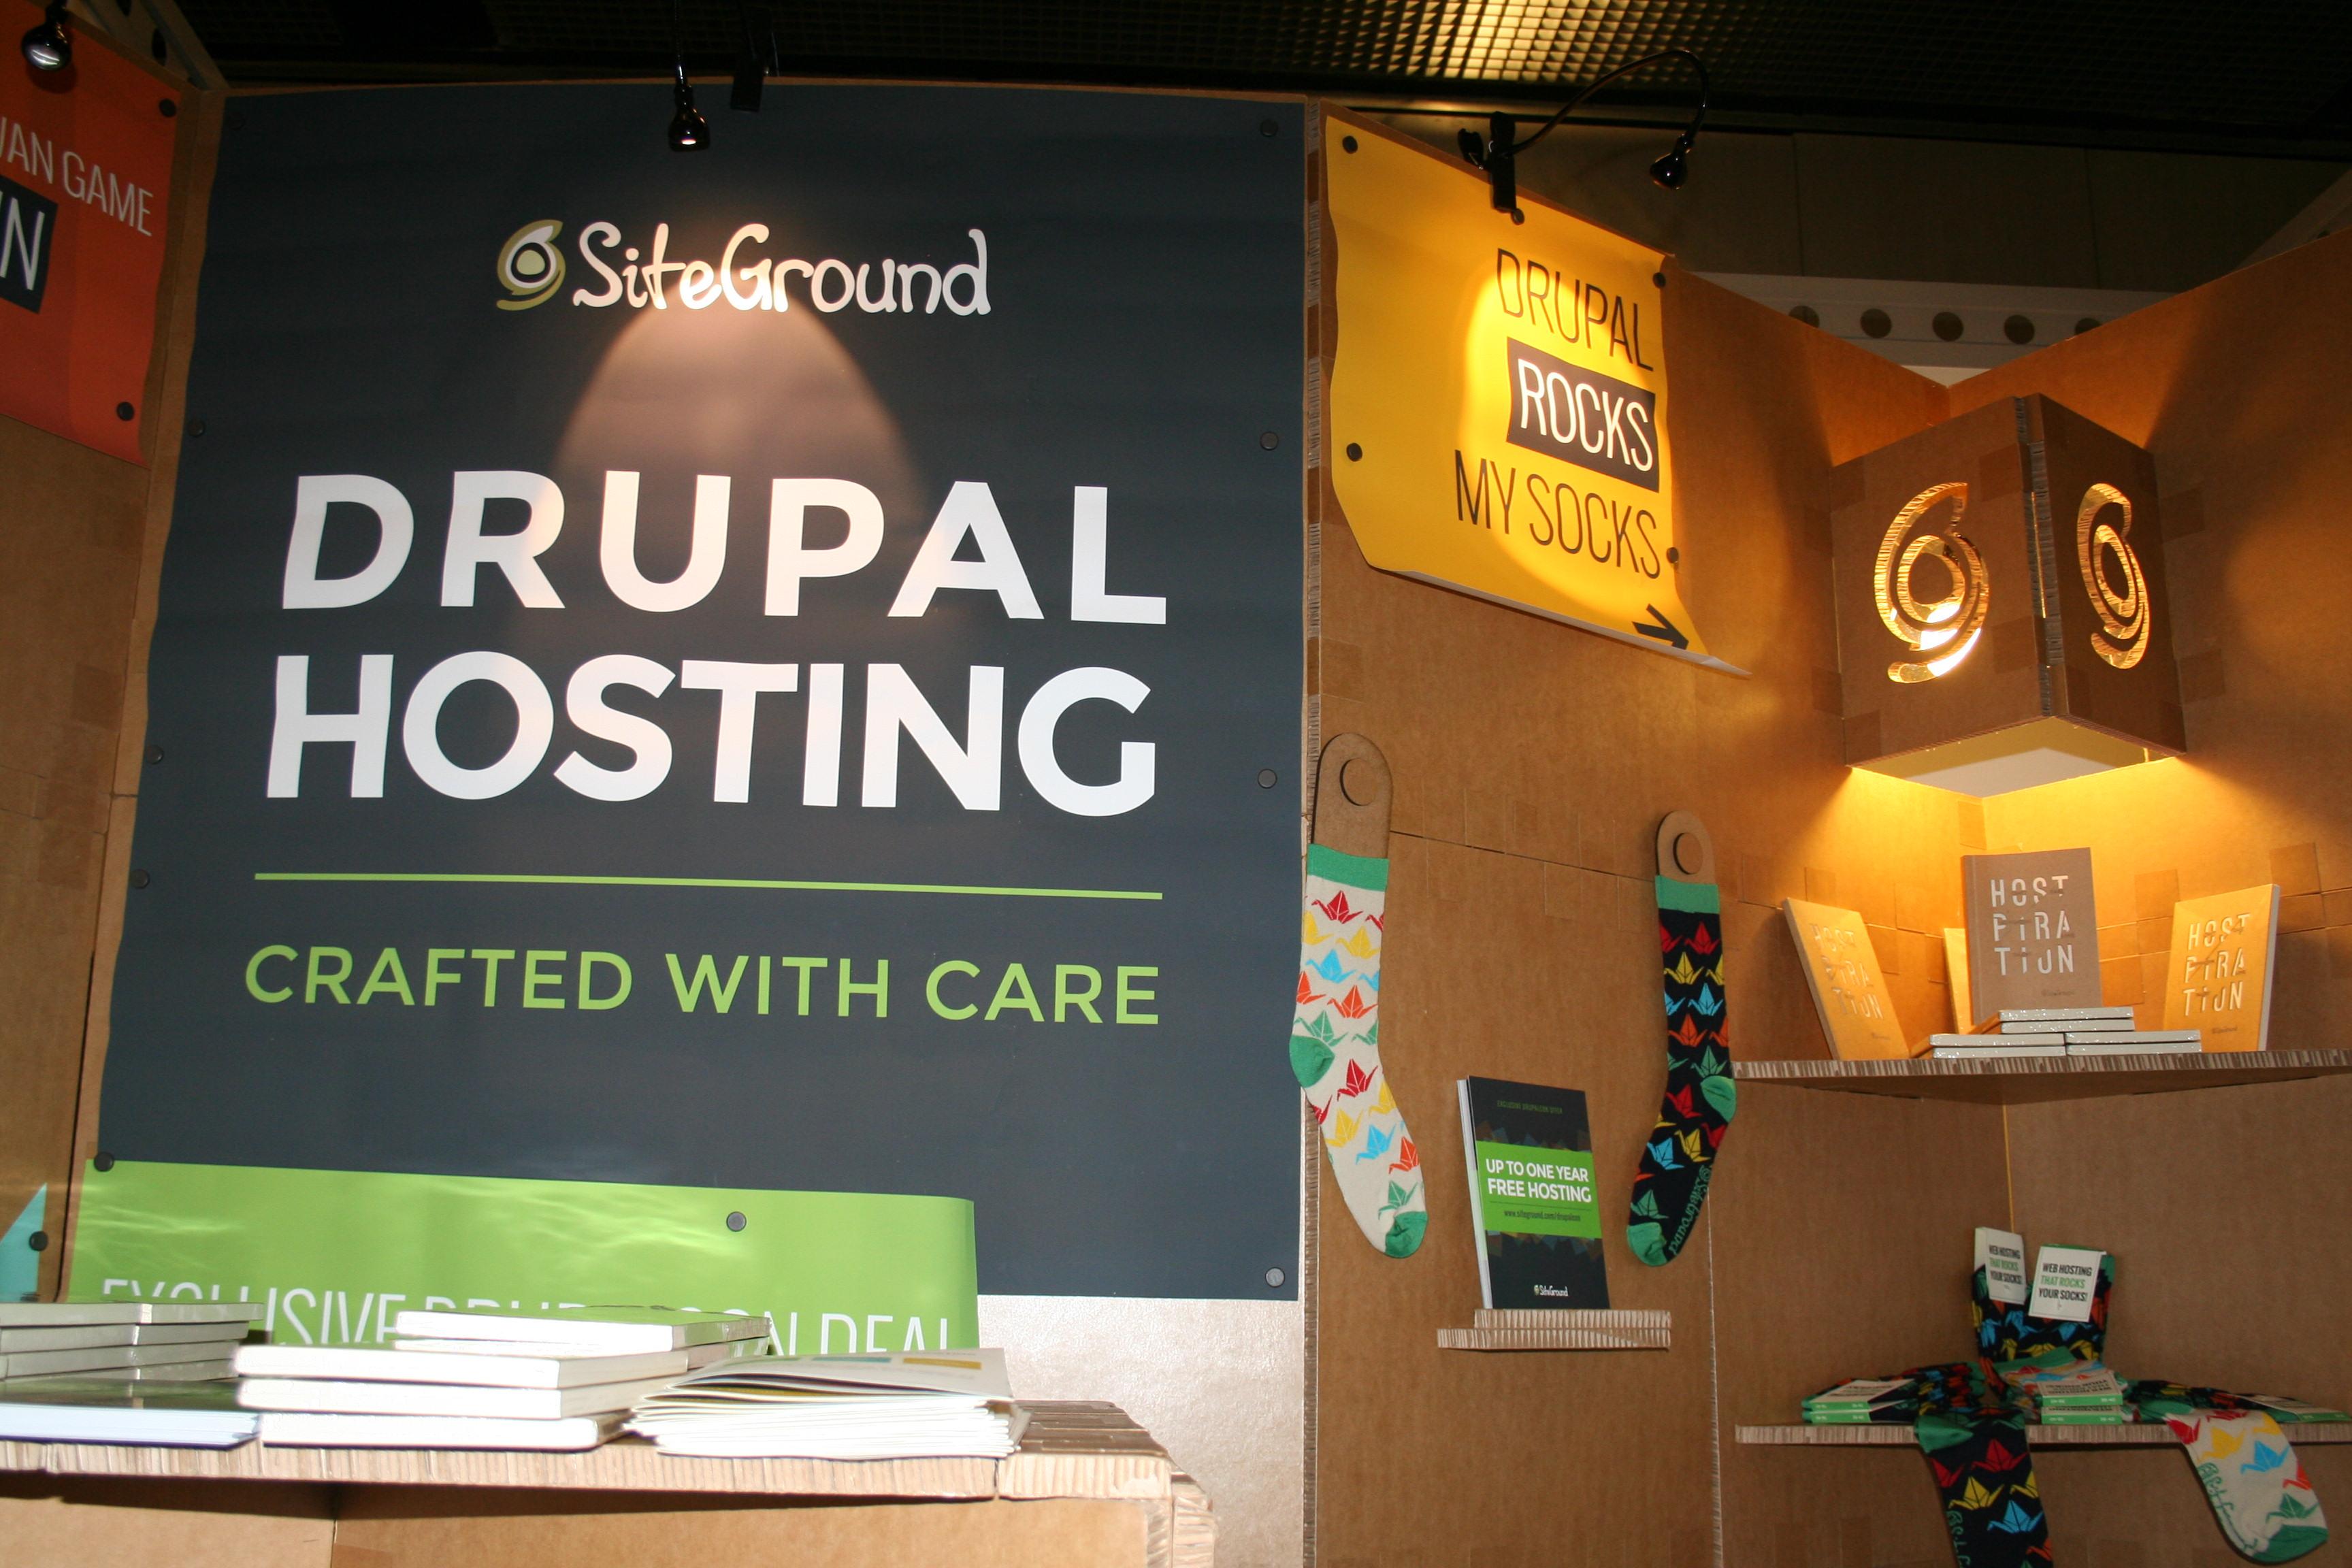 SiteGround DrupalCon Booth